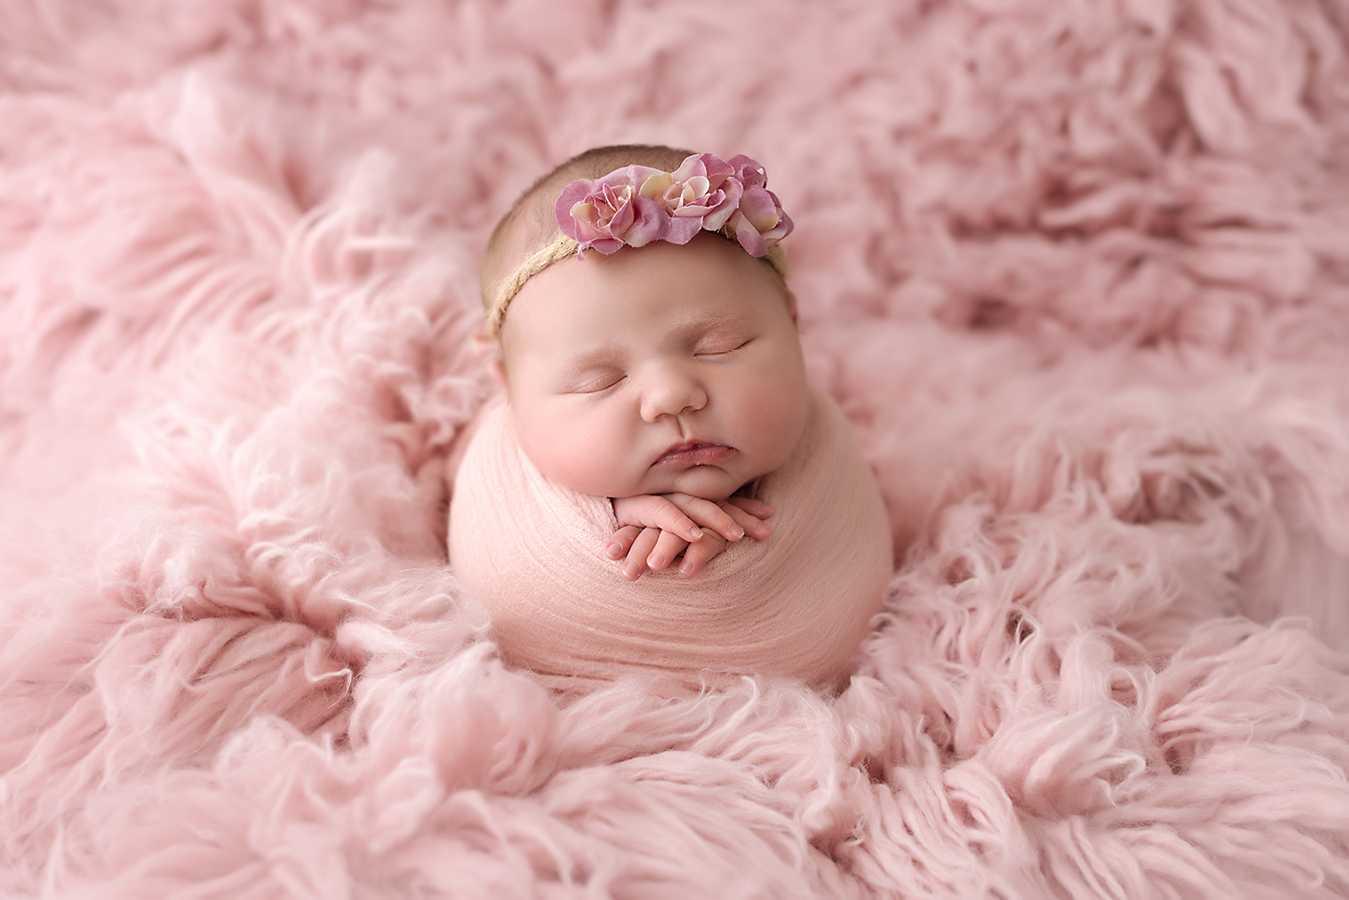 Newborn Photoshoot near me Stockport